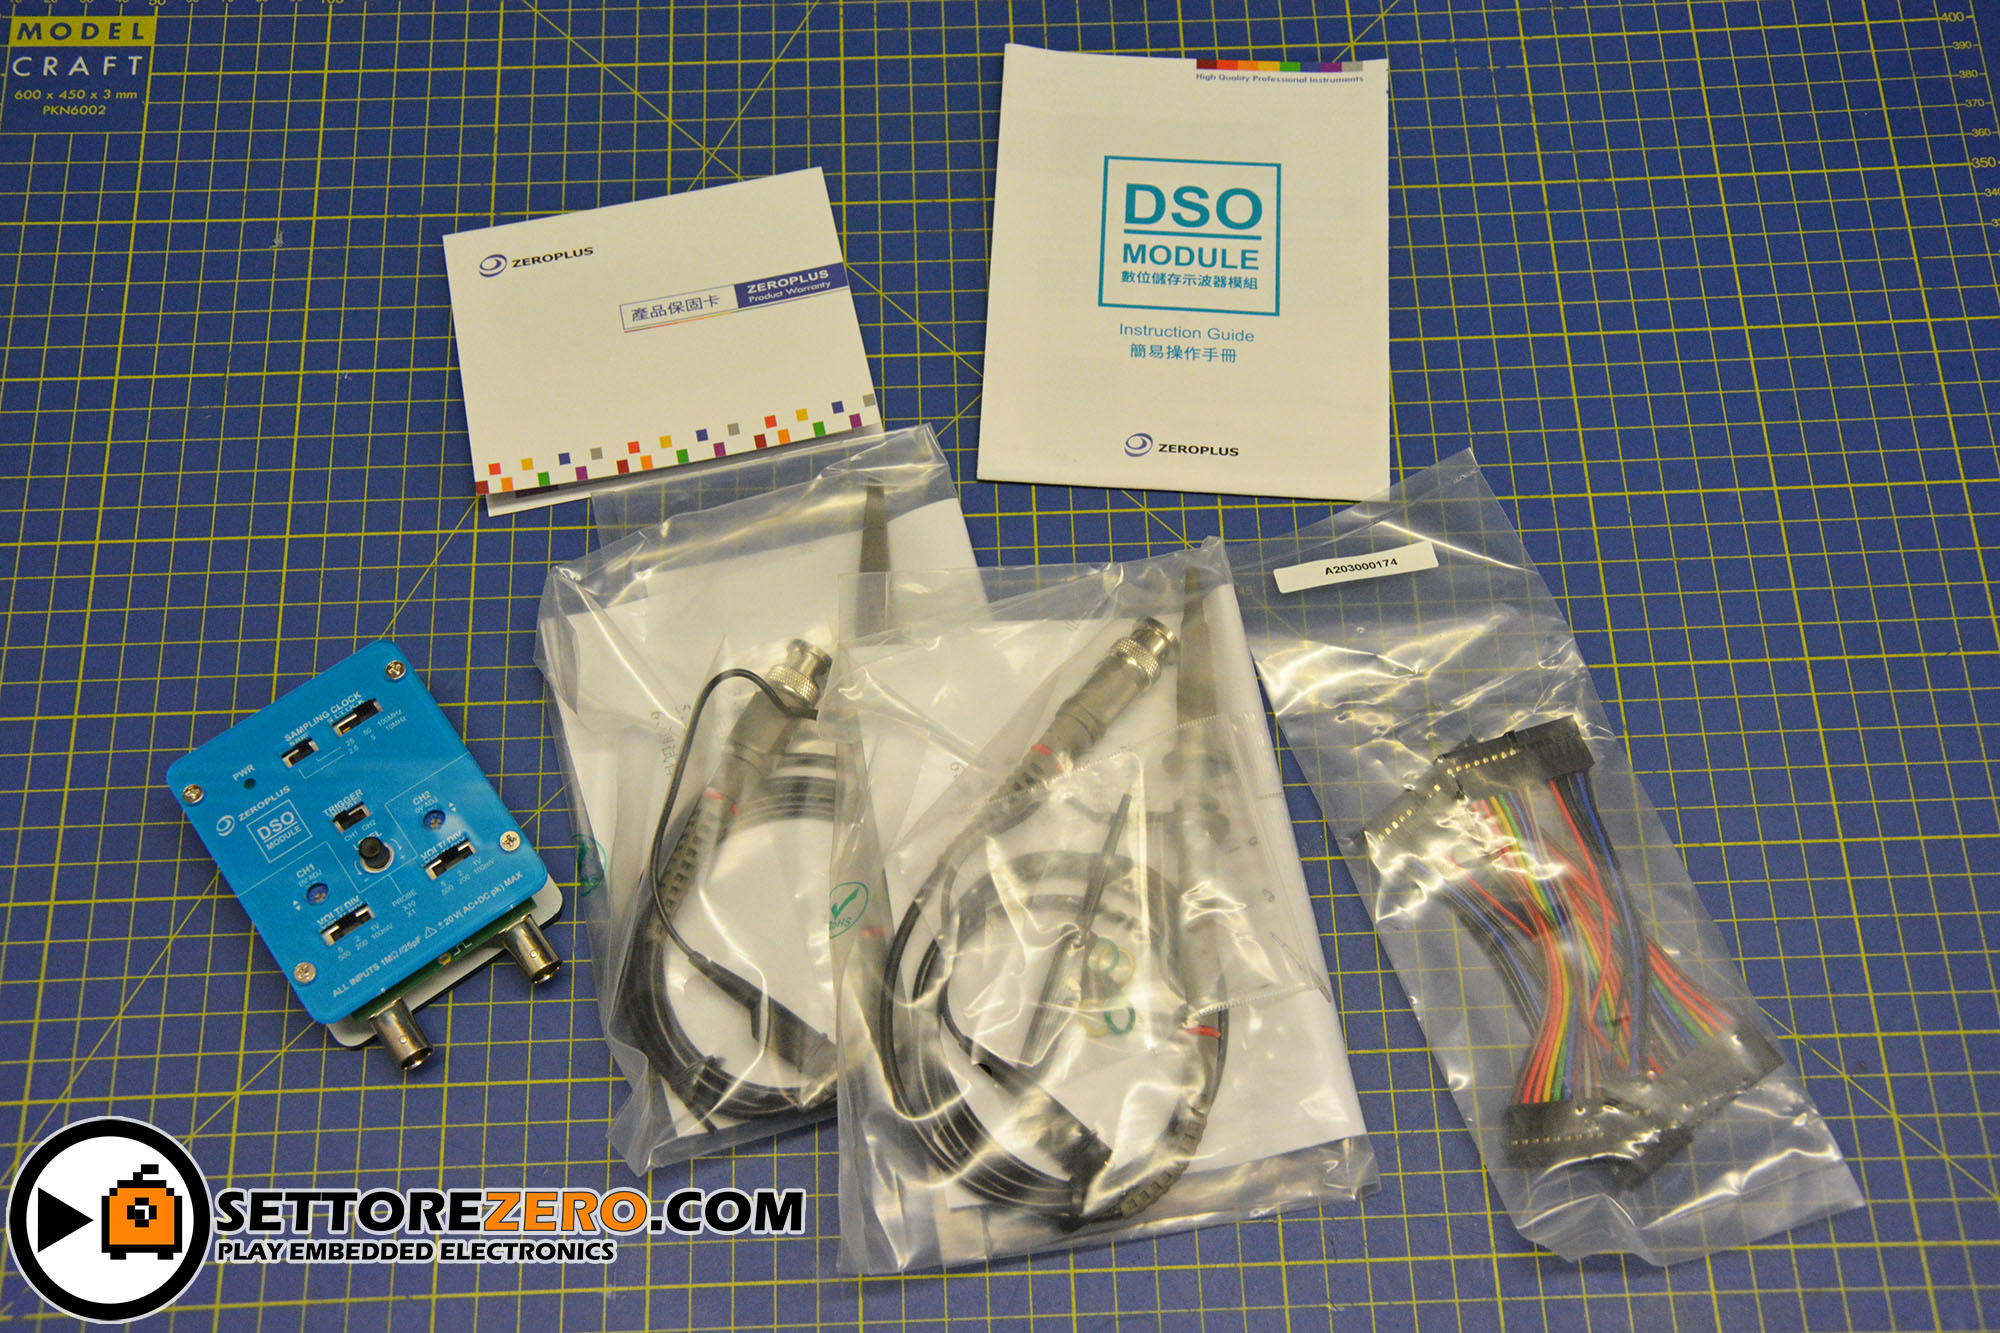 Zeroplus_DSO_module_001